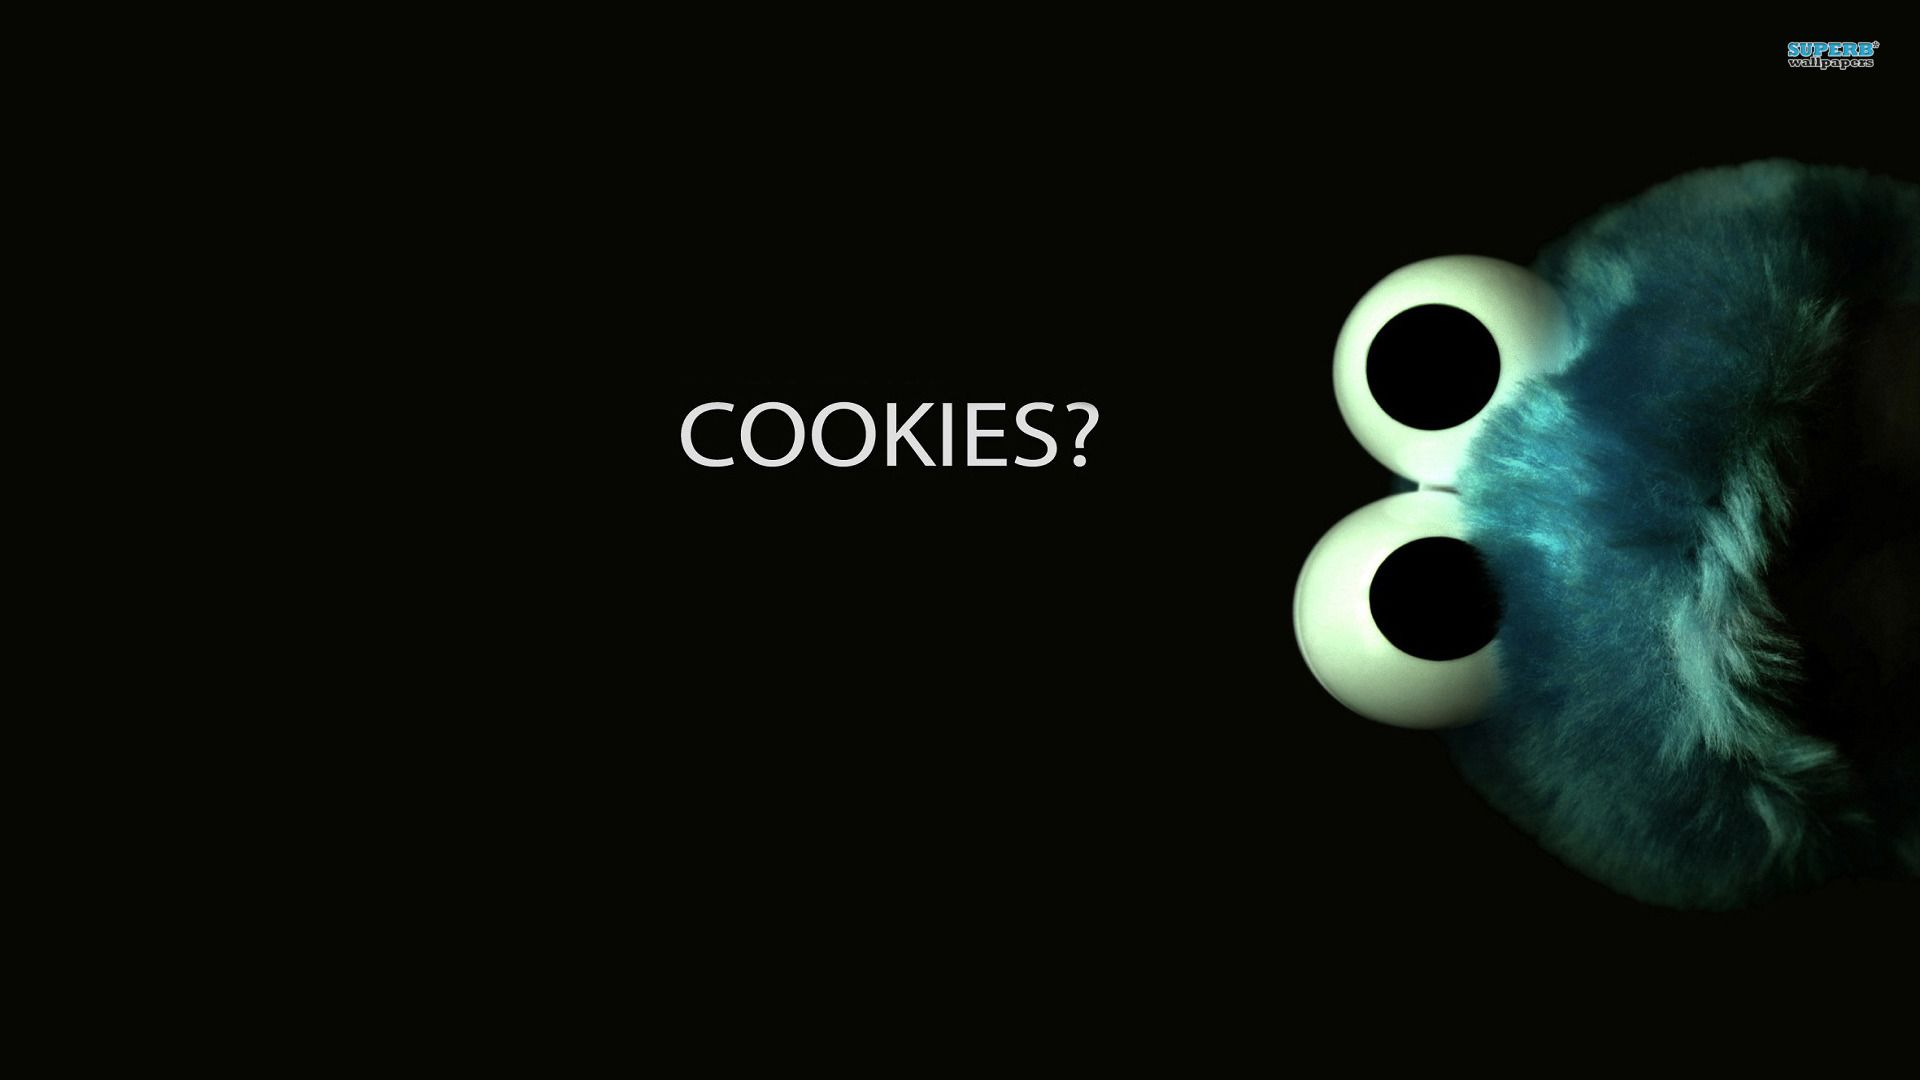 Cookie Monster Wallpapers Hd Free 273886 Cookie Monster Wallpaper Monster Cookies Funny Wallpapers